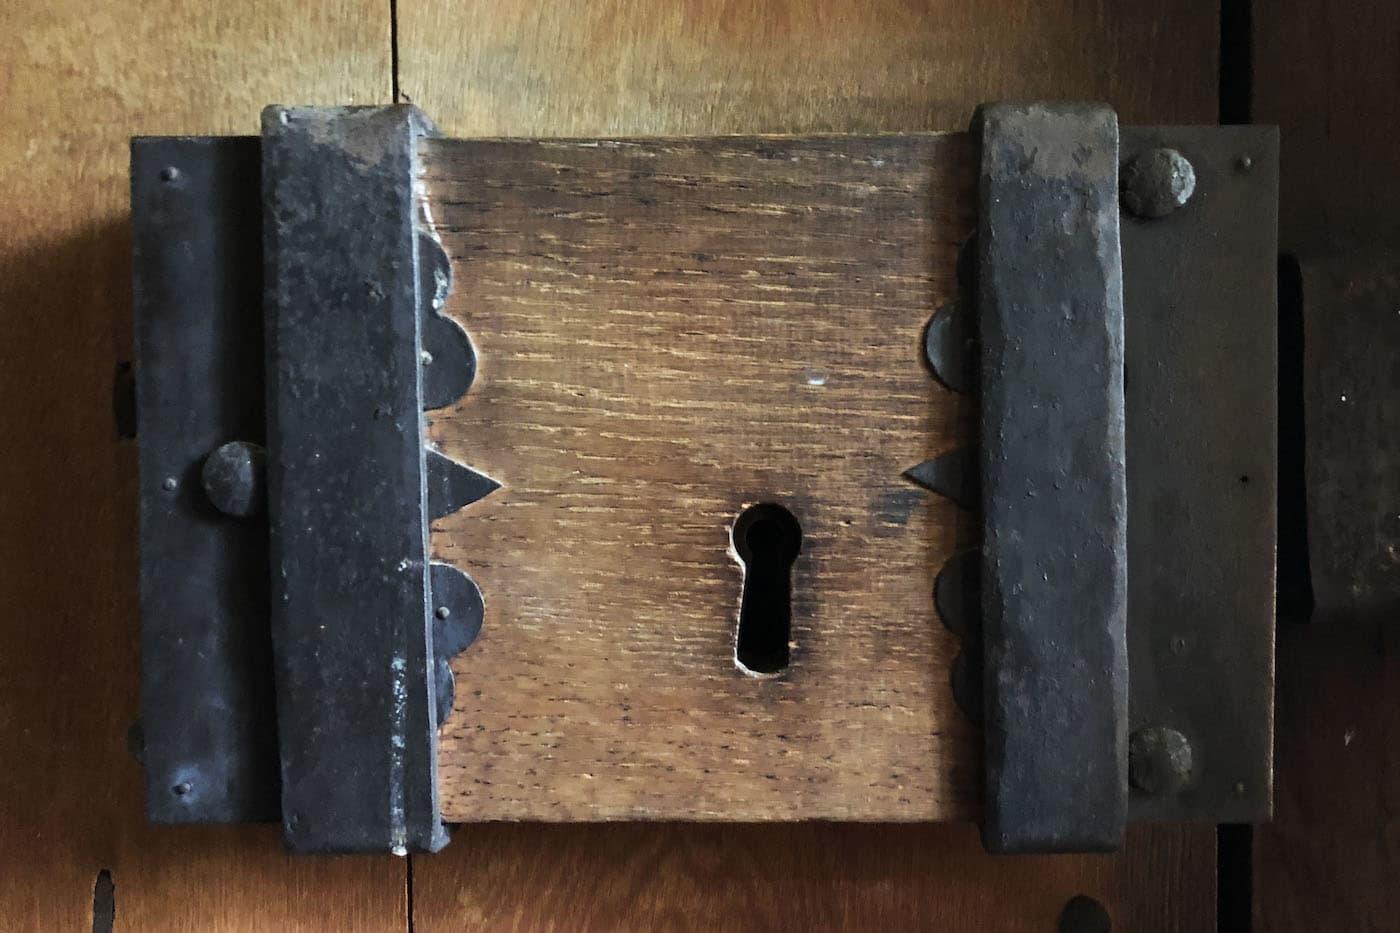 Colonial Williamsburg Escape Room: Spies & Lies